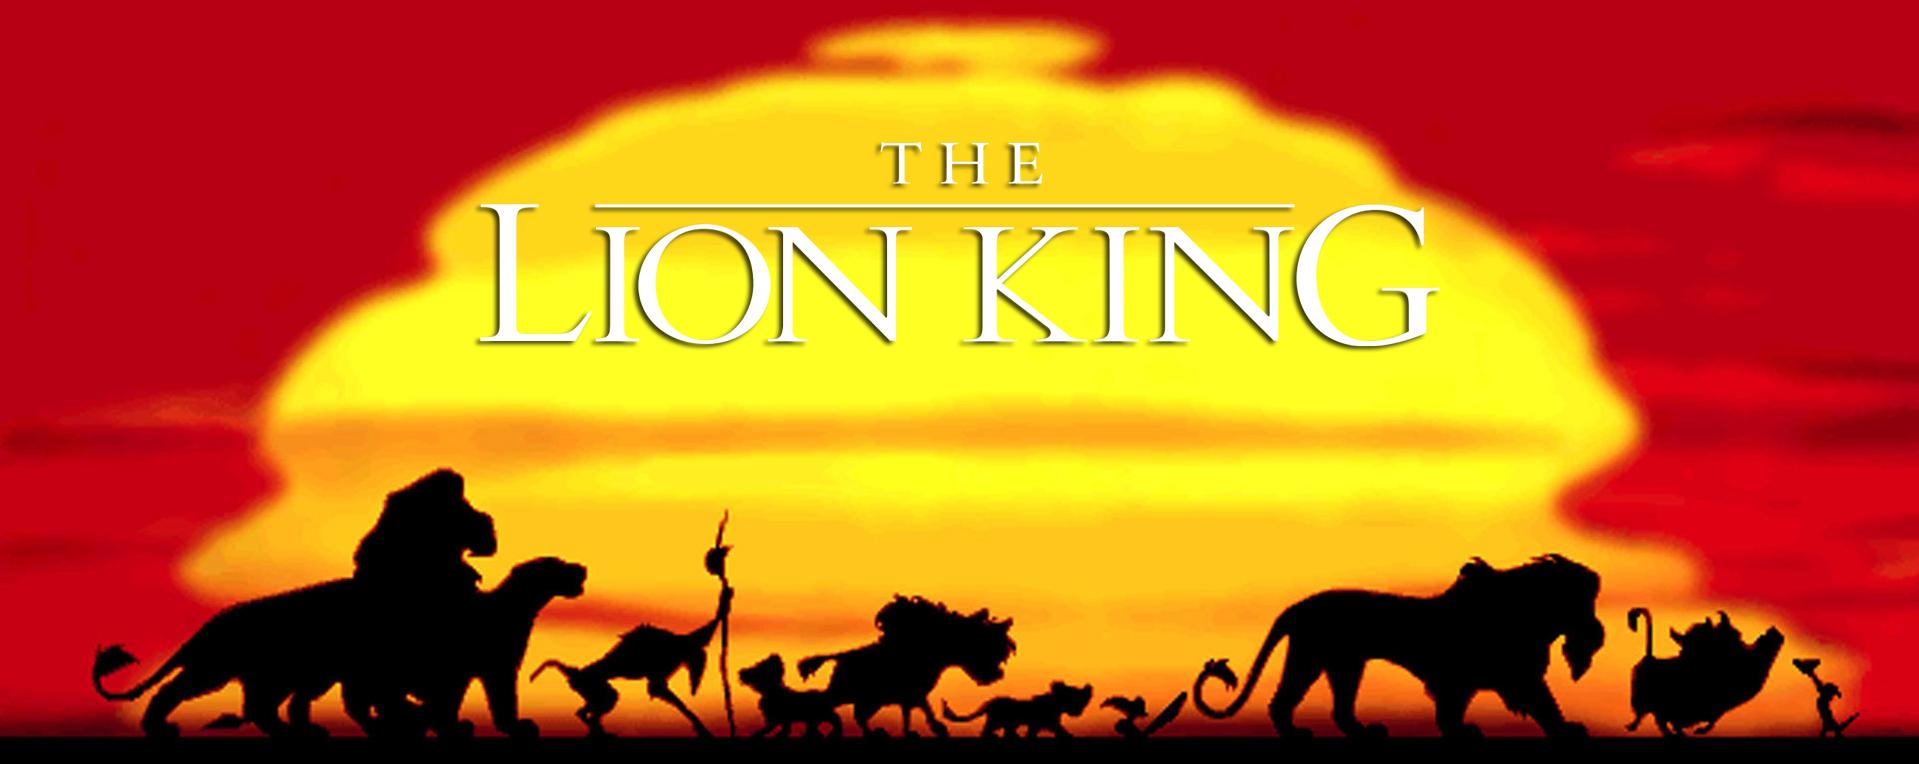 Wildcardwednesday Disney S The Lion King Circle Of